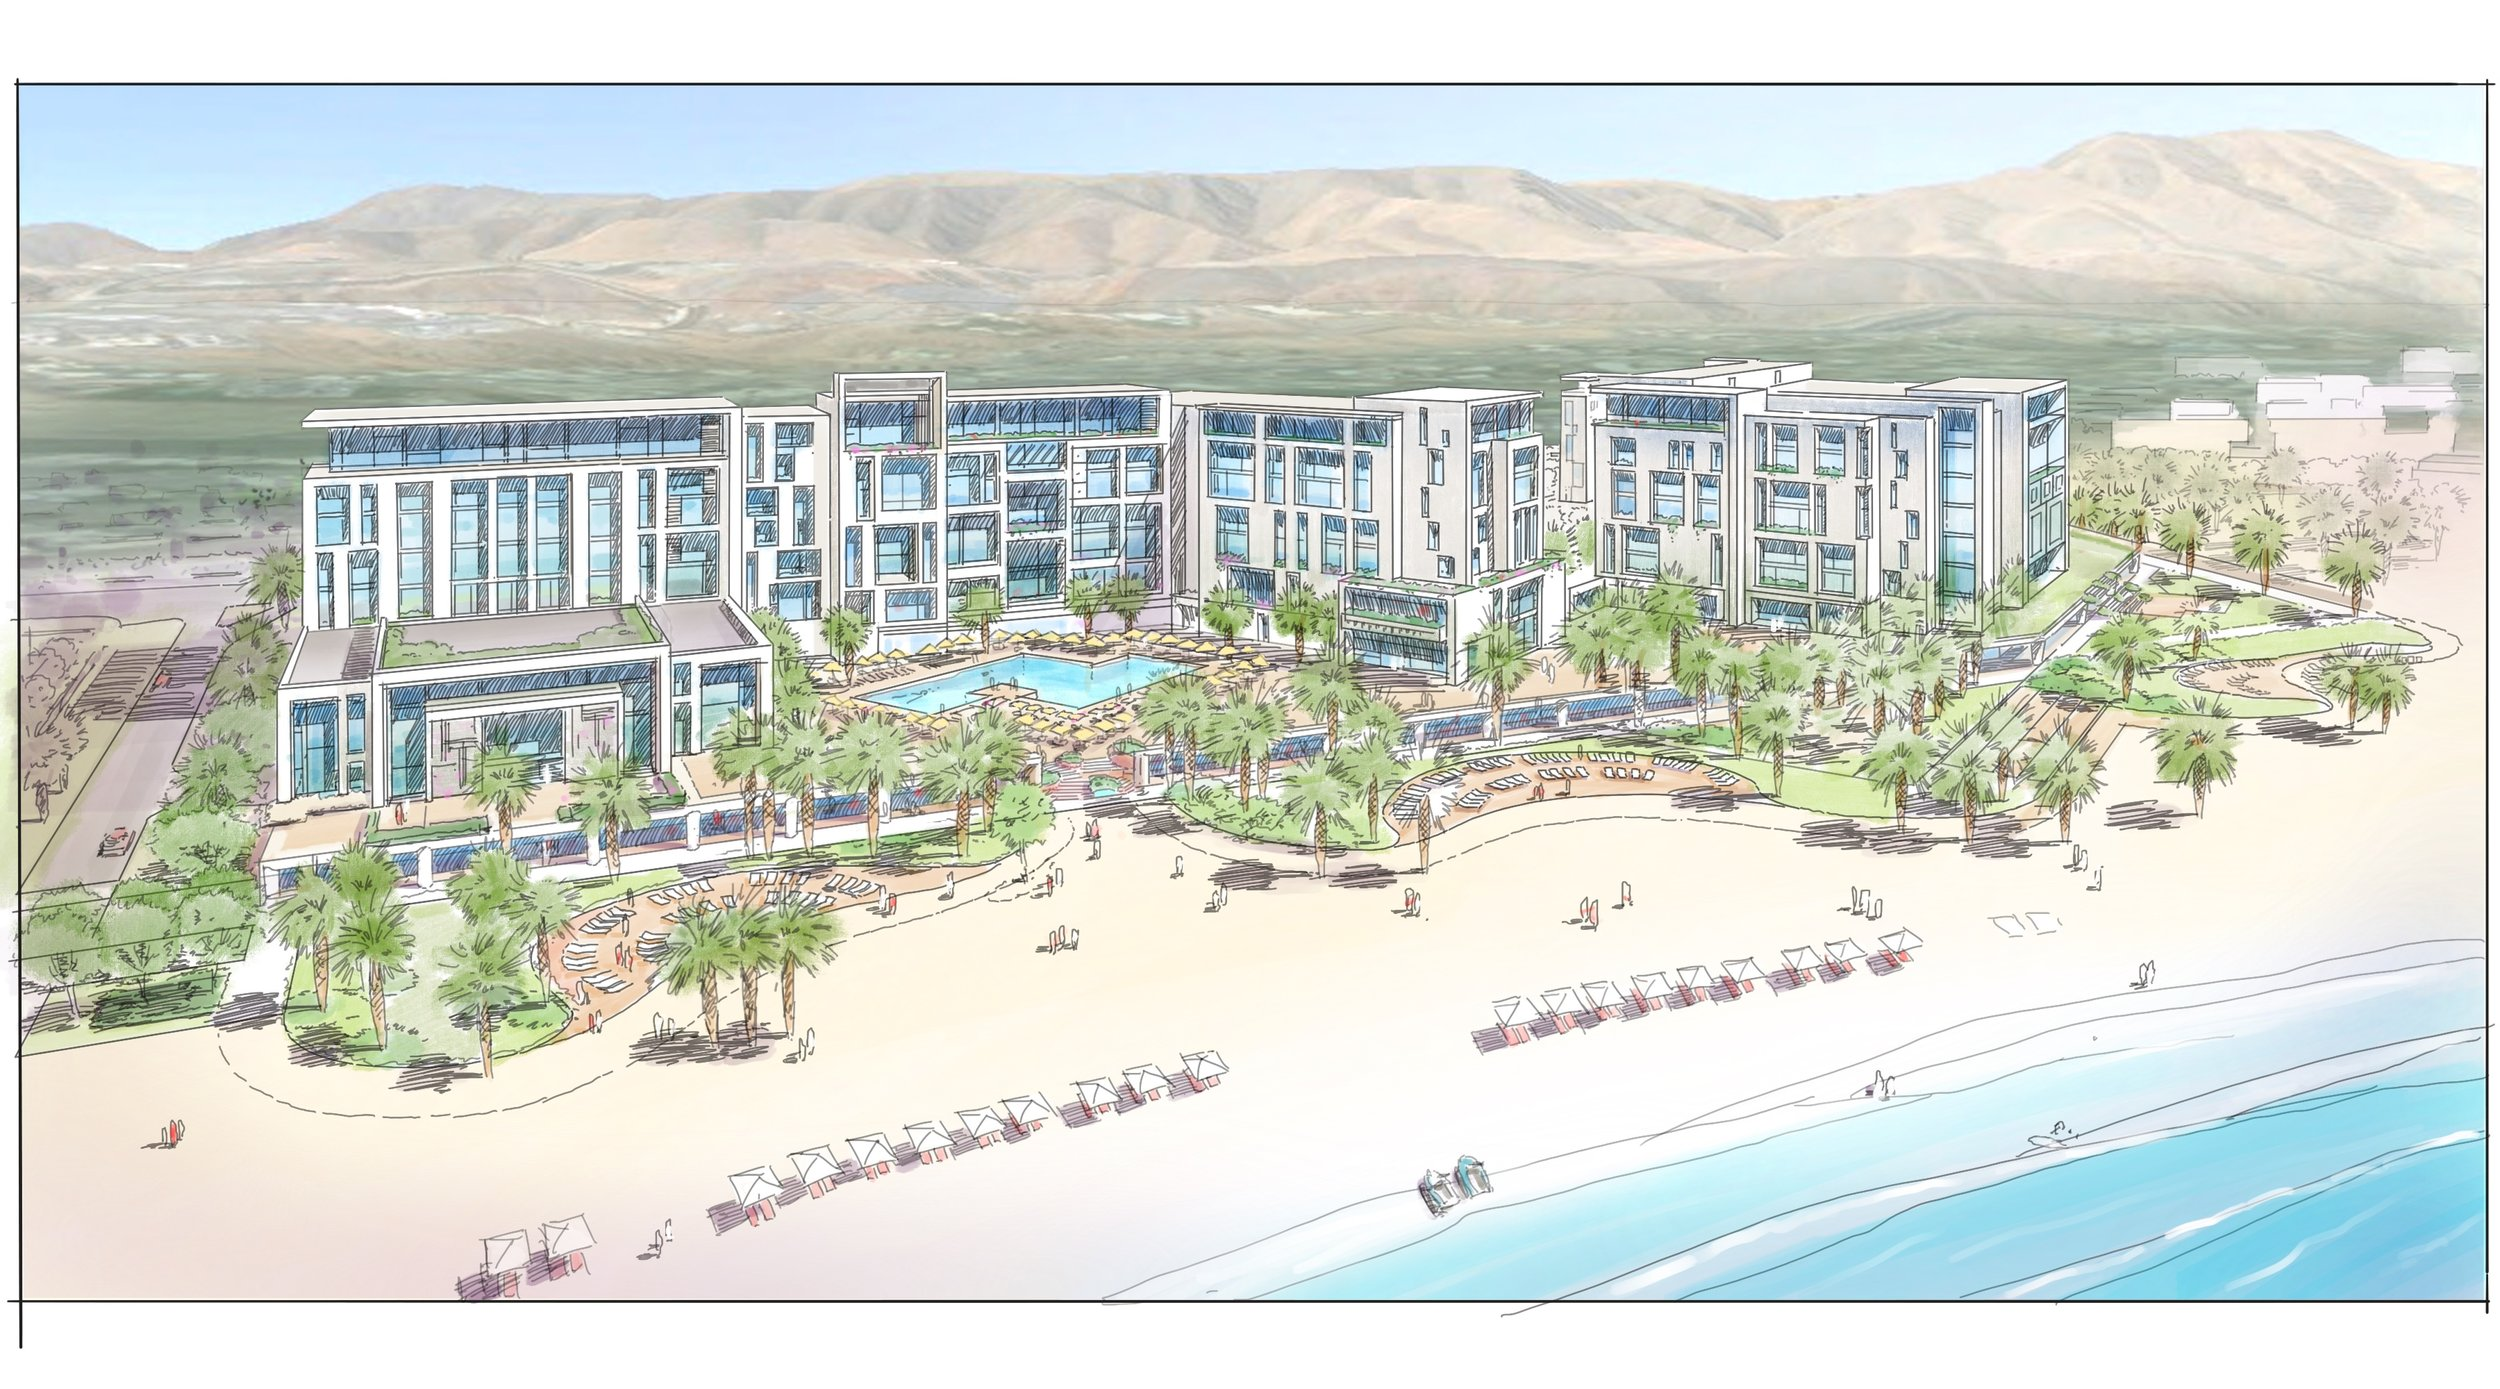 Oman-water_side.jpg